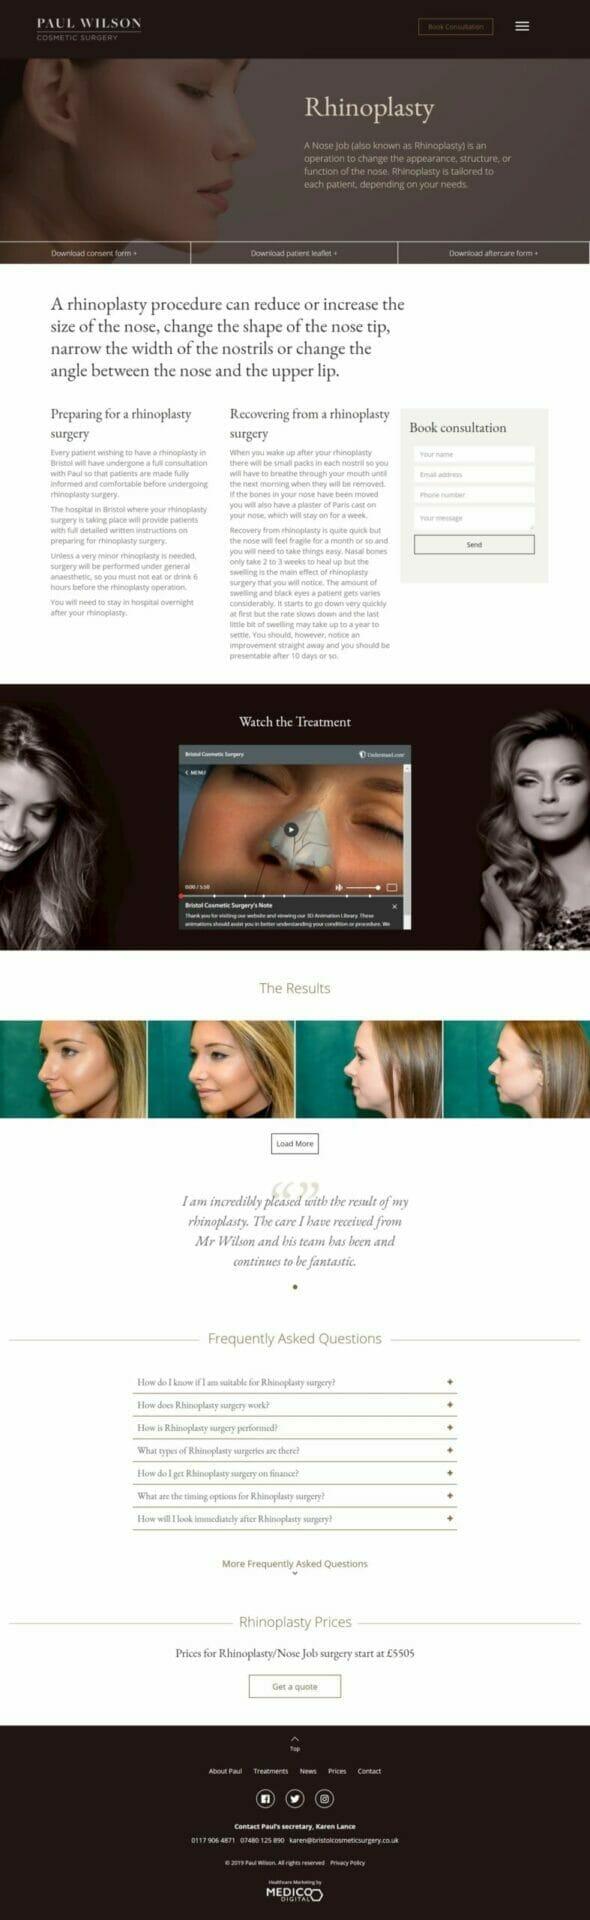 Paul Wilson Cosmetic Surgery website design portfolio